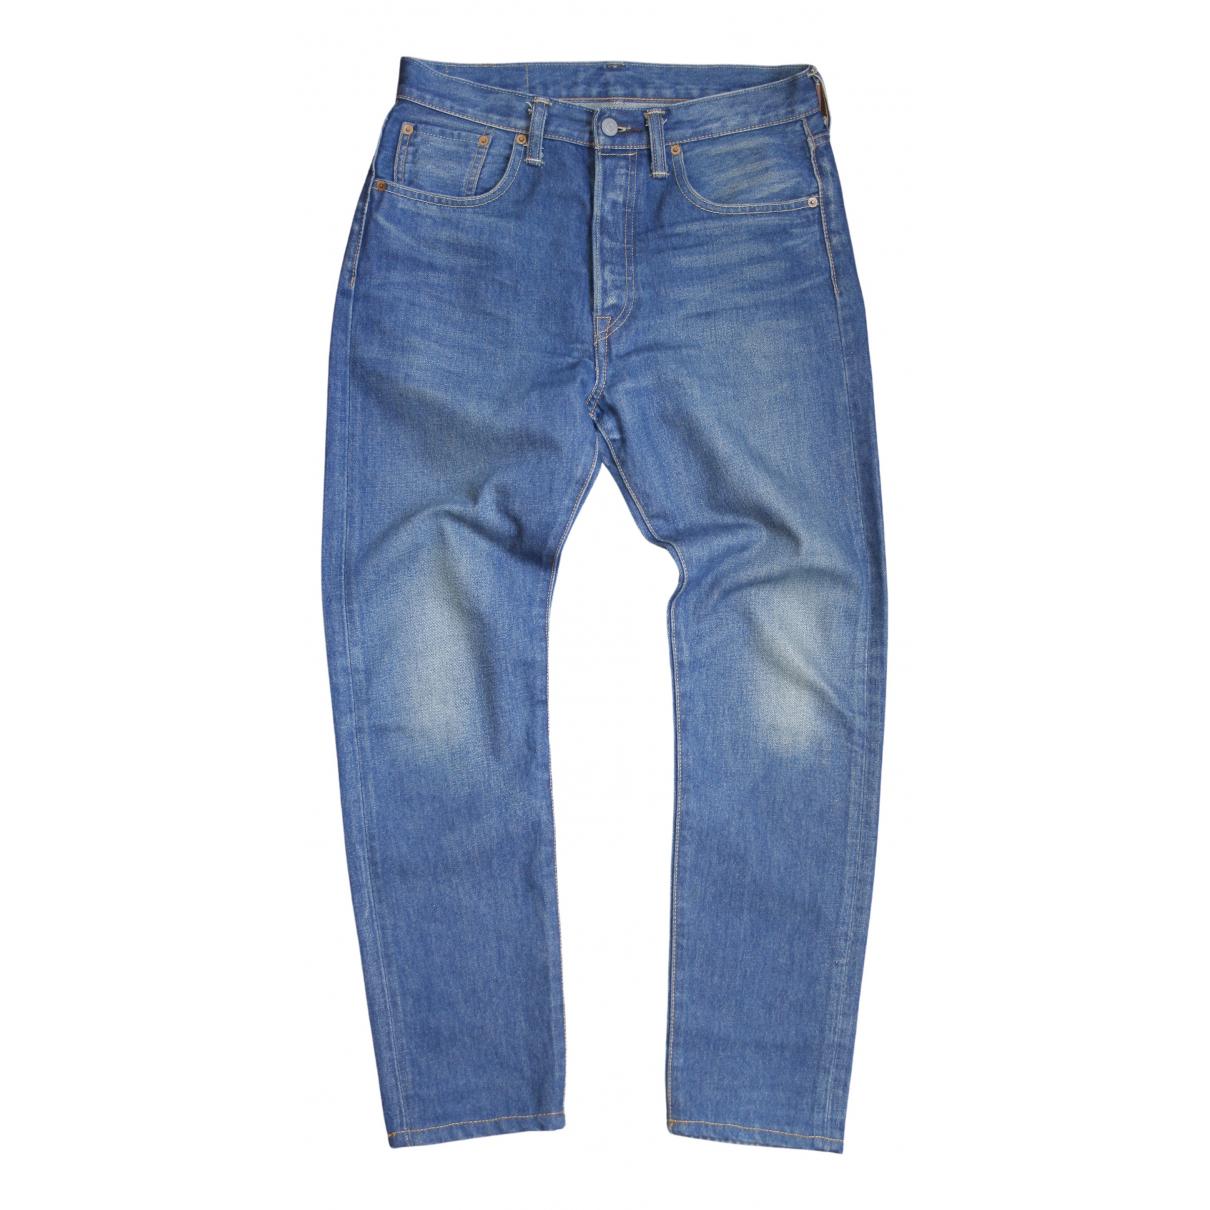 Levi's \N Navy Denim - Jeans Trousers for Men 30 UK - US